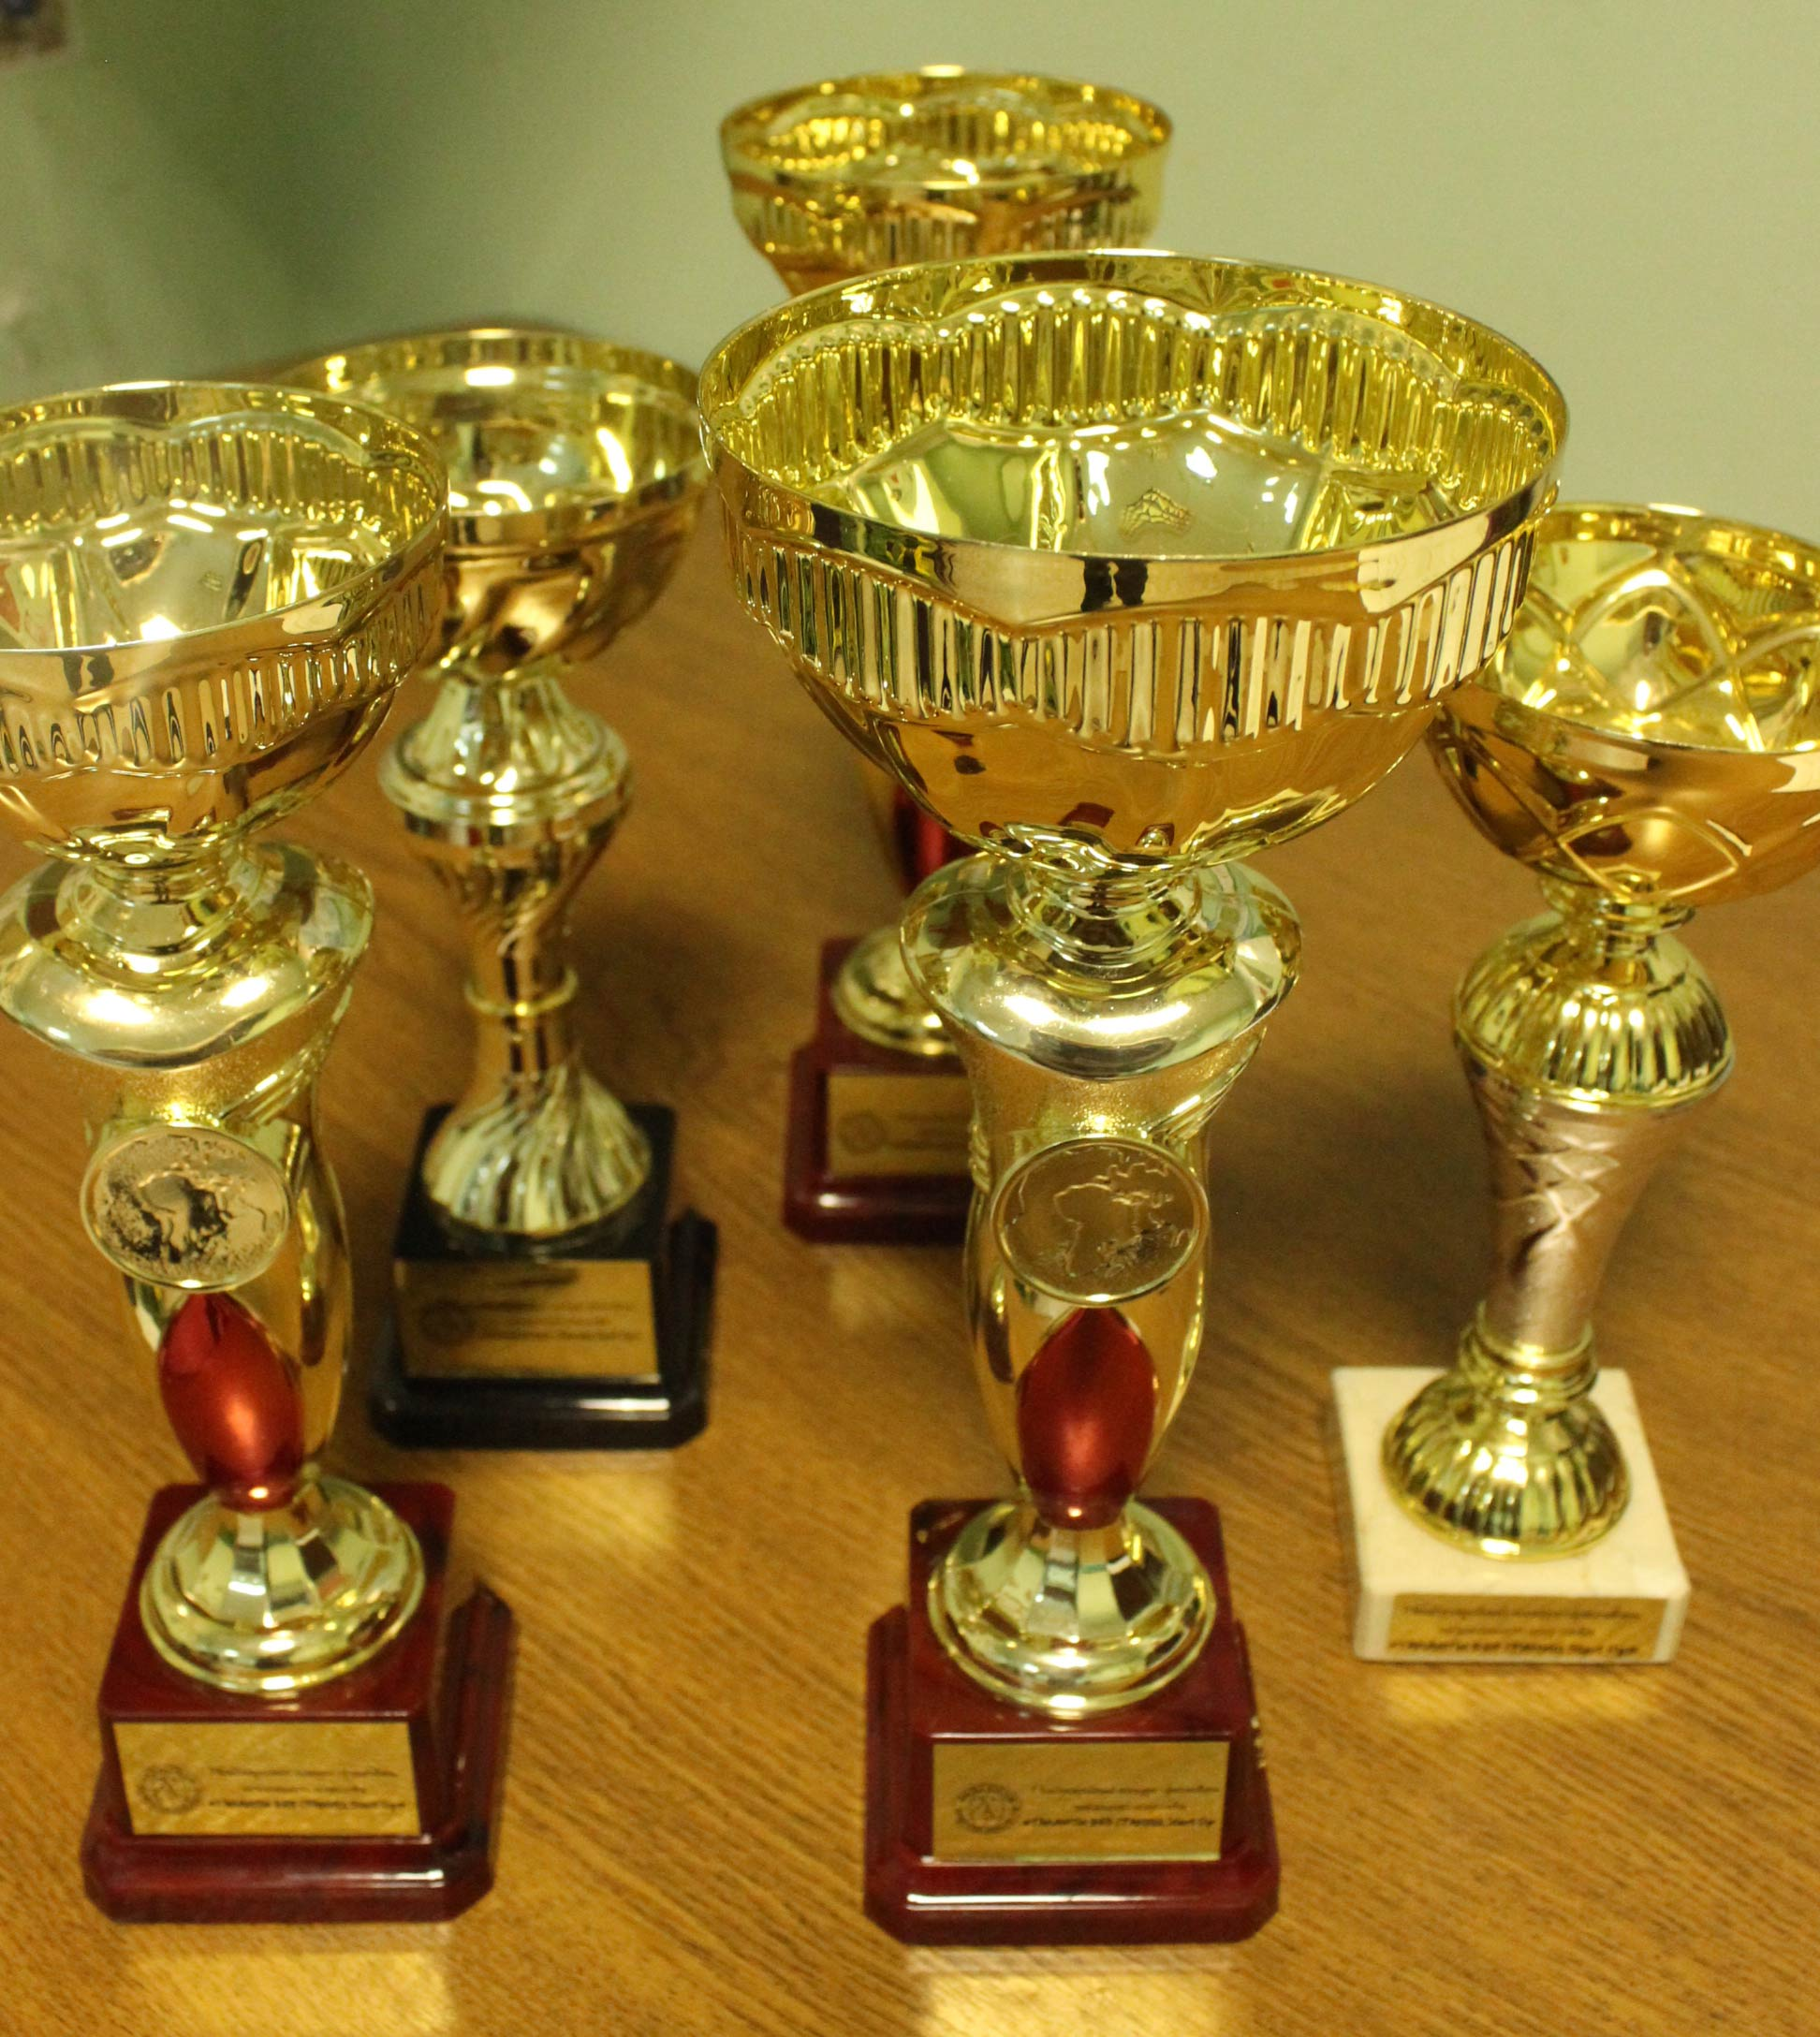 Калужский творческий коллектив «Колорит» оценили на международном фестивале